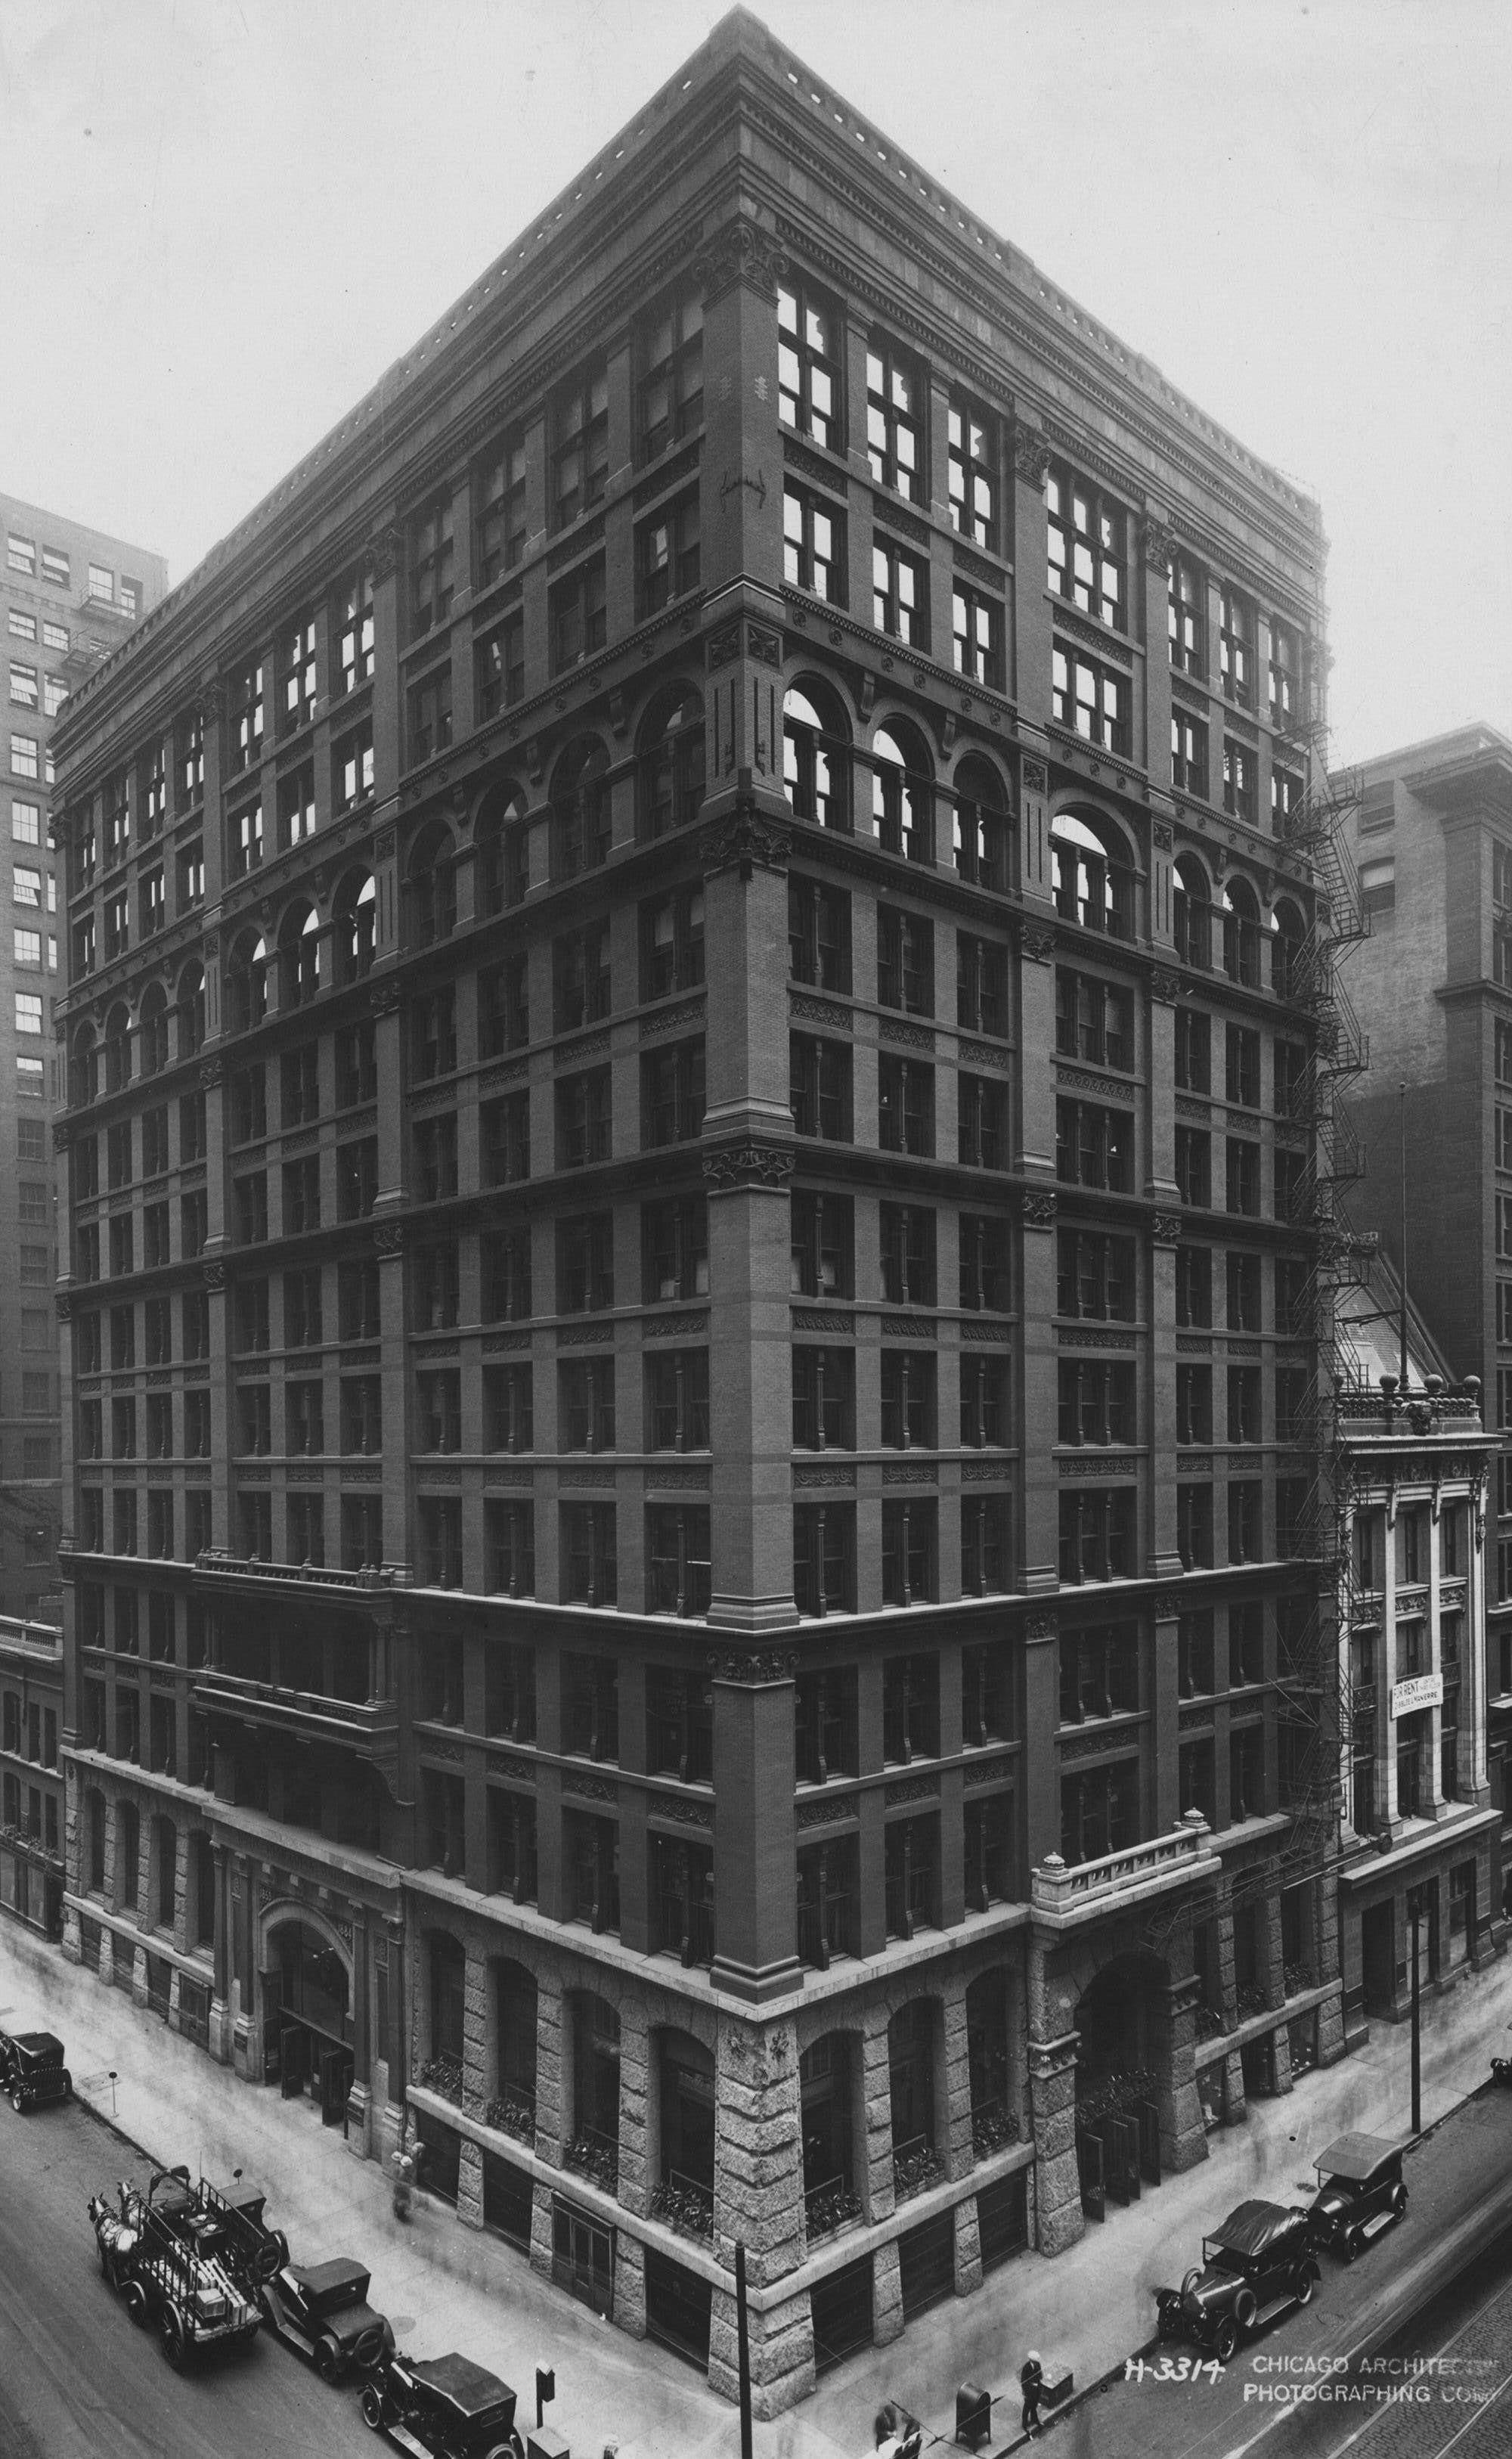 Home Insurance Building, William Le Baron Jenney (1885